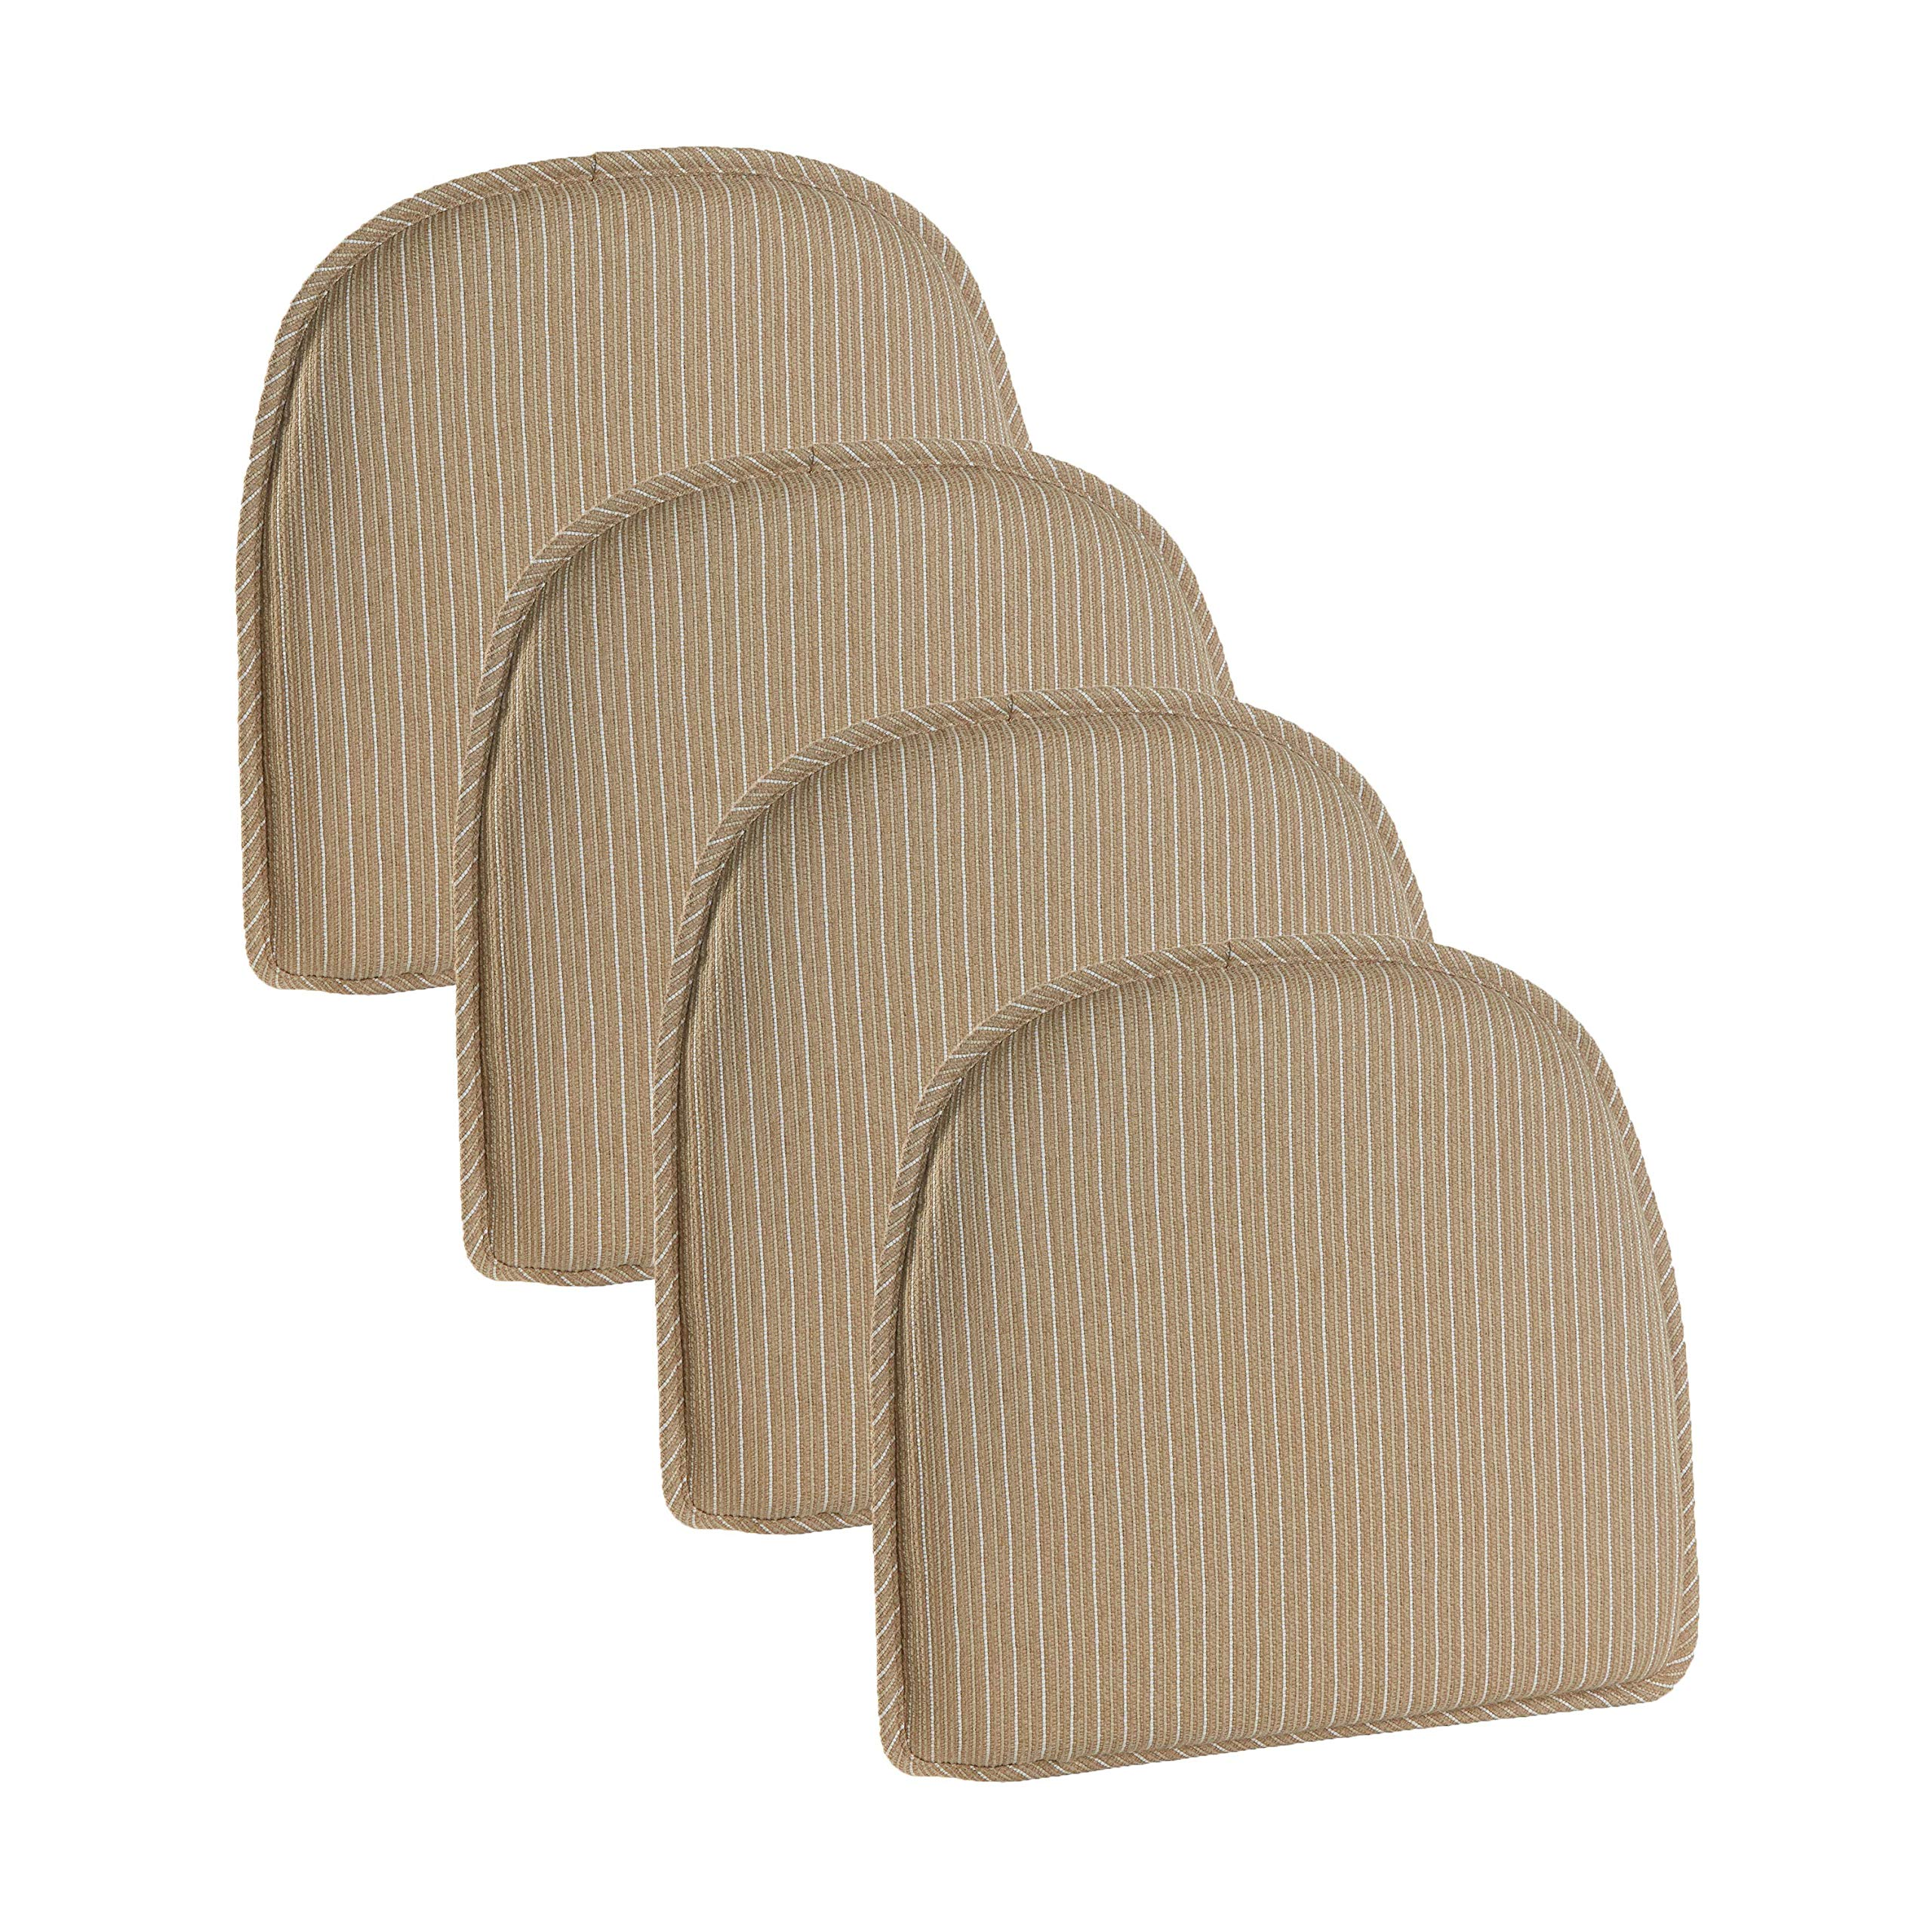 Klear Vu Nakita Striped Non-Slip Dining Kitchen Chair Pads, 15'' x 16'', Set of 4 Cushions, Natural